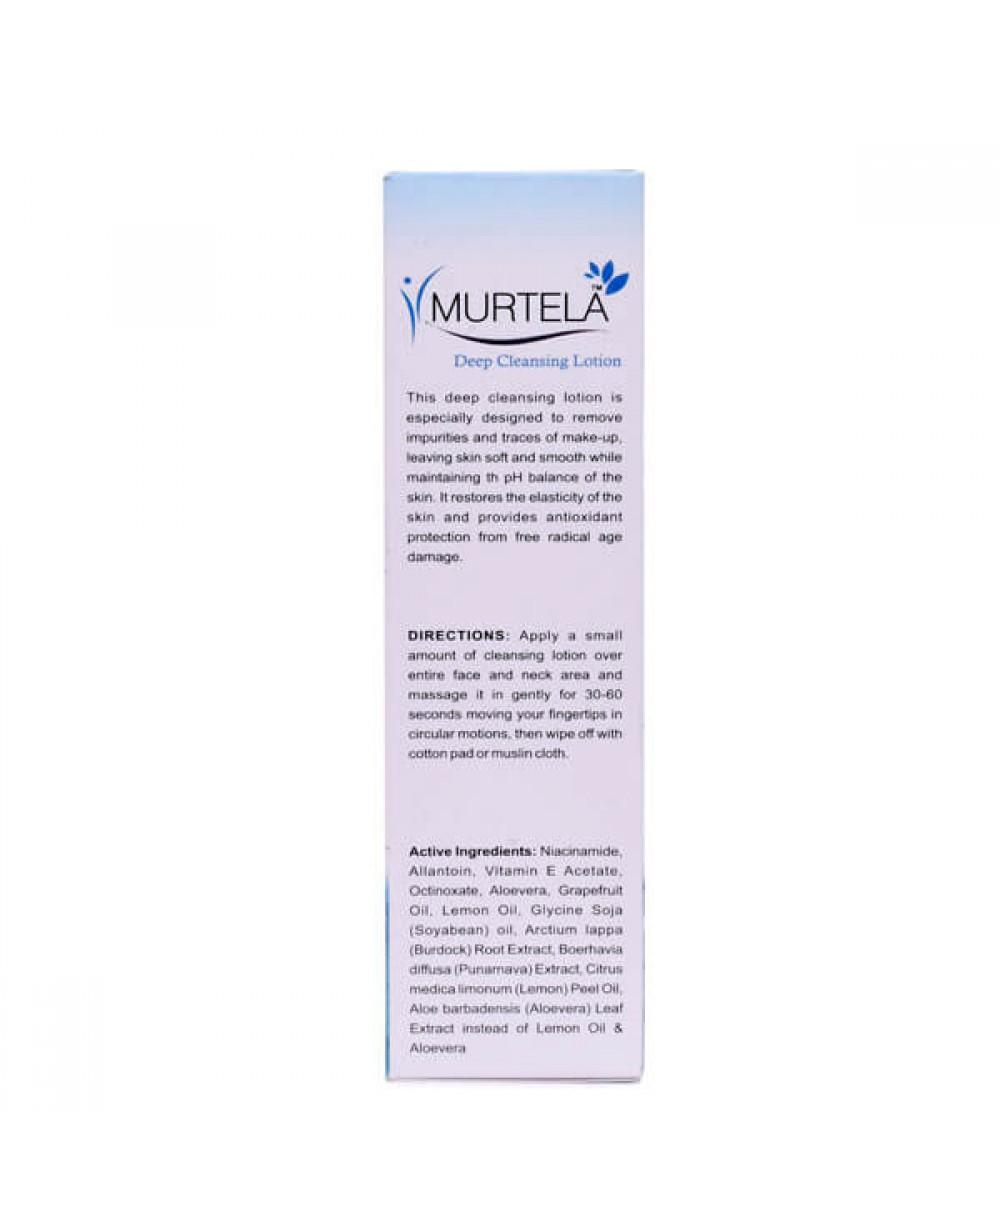 Murtela Deep Cleansing Lotion, 100 ml